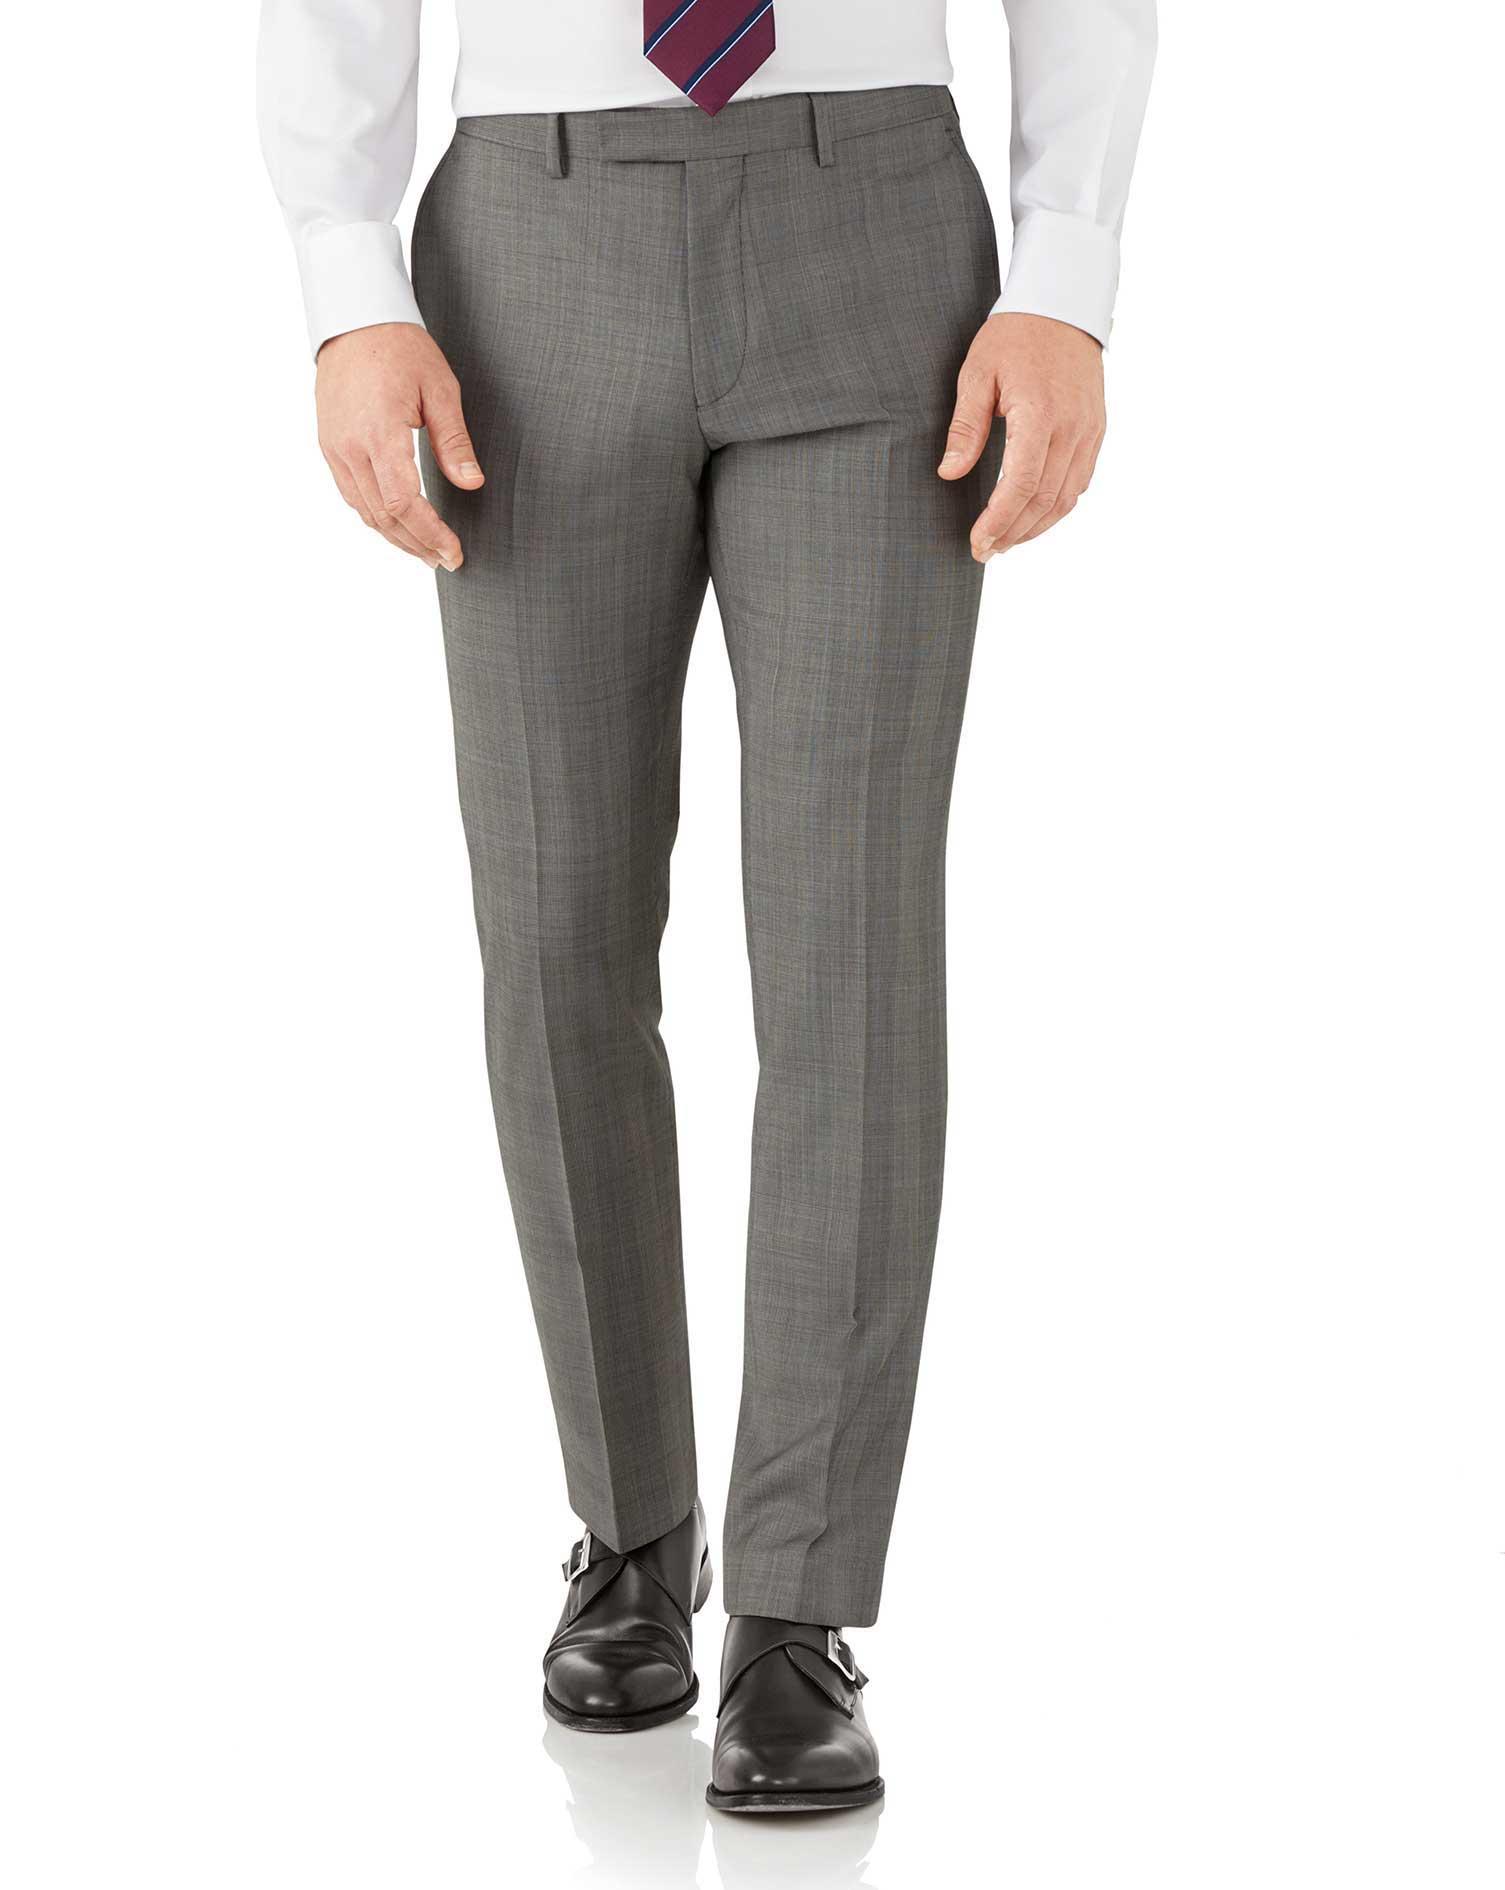 Silver Slim Fit Italian Sharkskin Luxury Check Suit Trousers Size W36 L32 by Charles Tyrwhitt